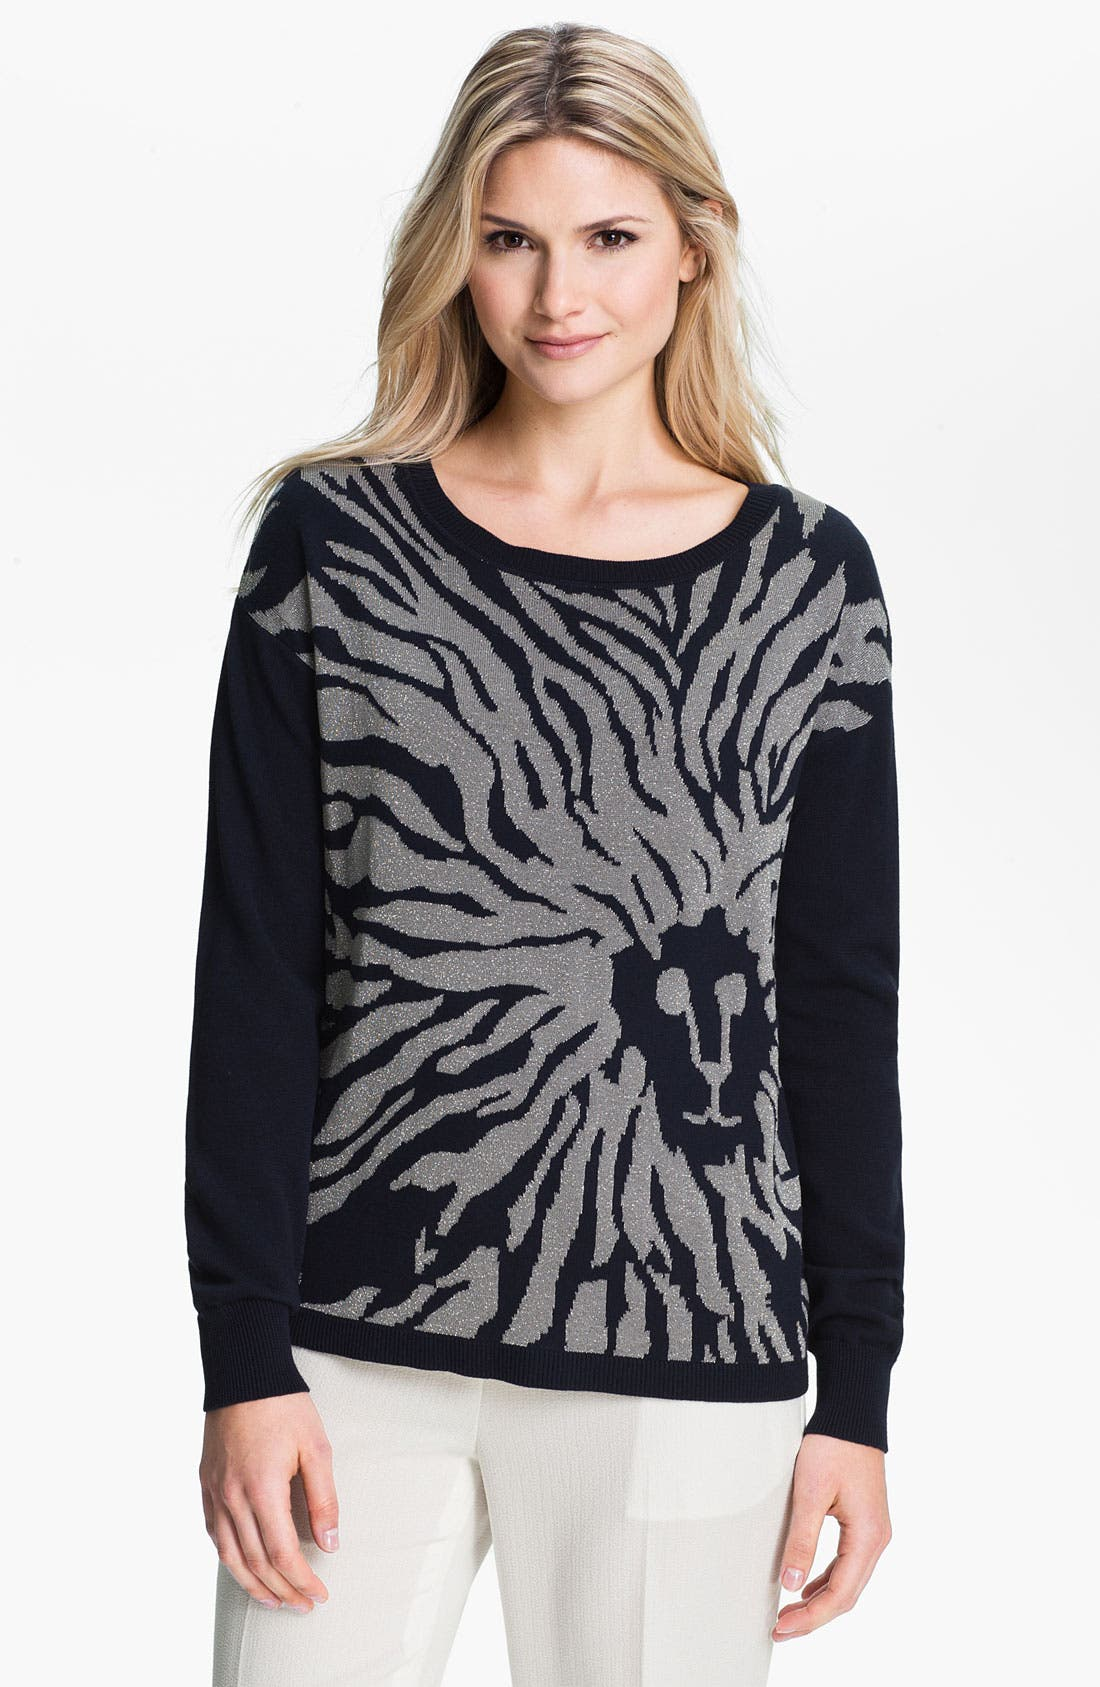 Alternate Image 1 Selected - Anne Klein Metallic Print Sweater